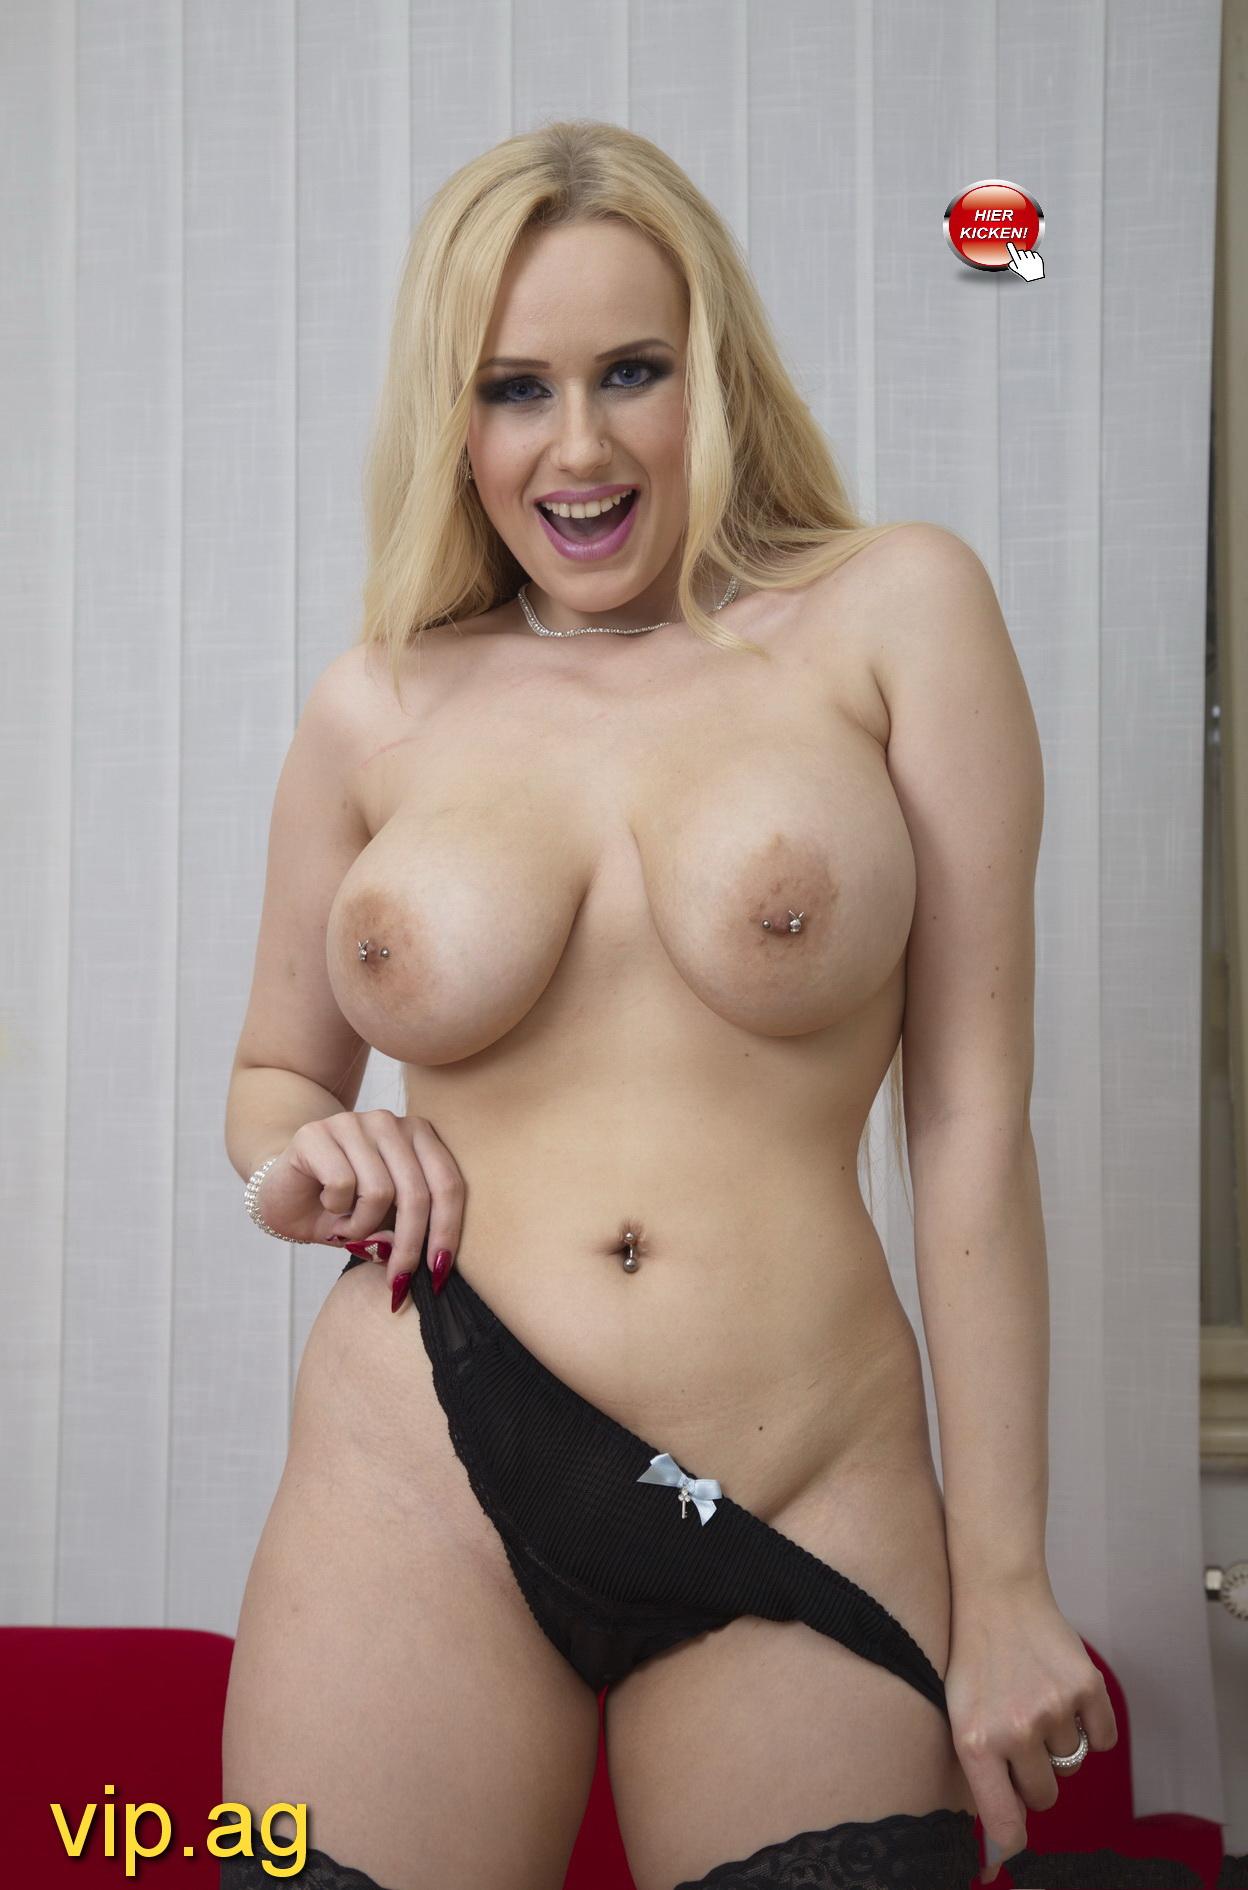 Sexy Gitte Ingolstadt